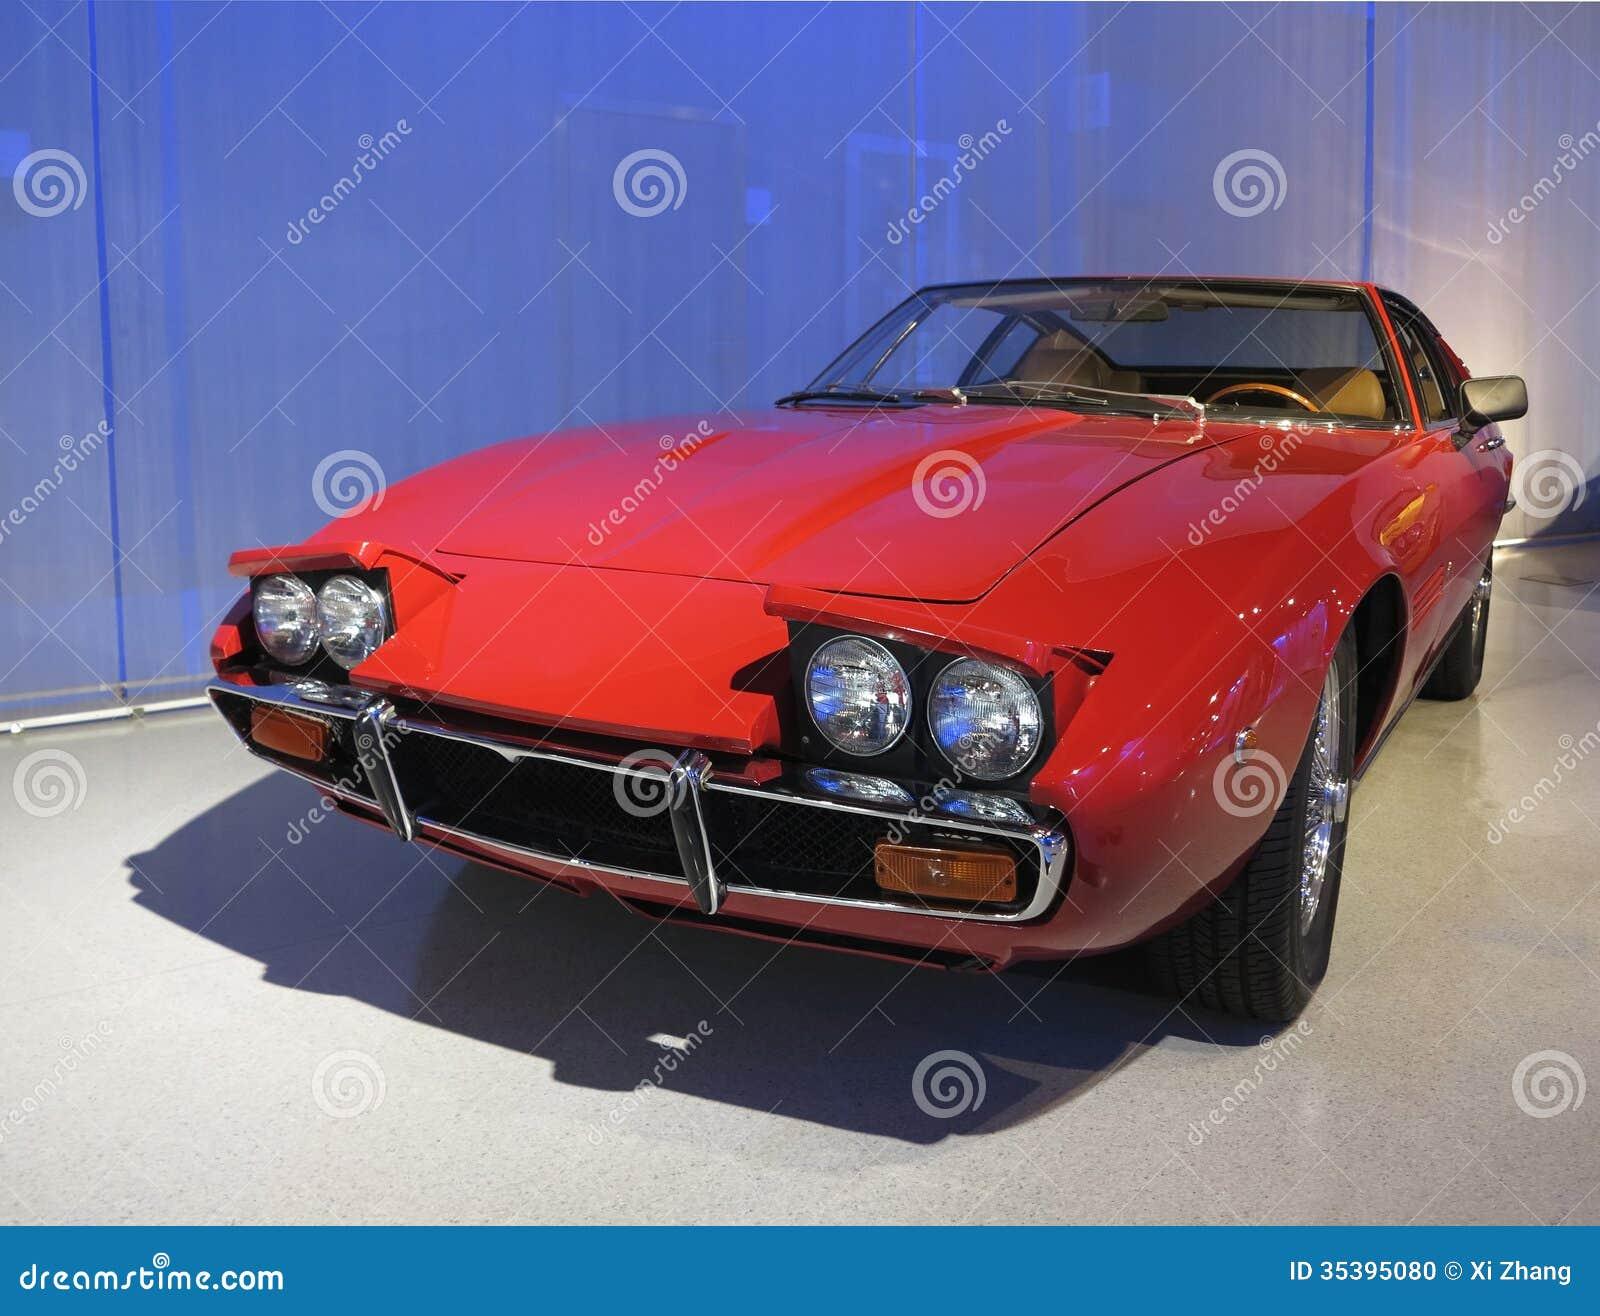 Vieille voiture de maserati photo stock image 35395080 for Salon vieilles voitures